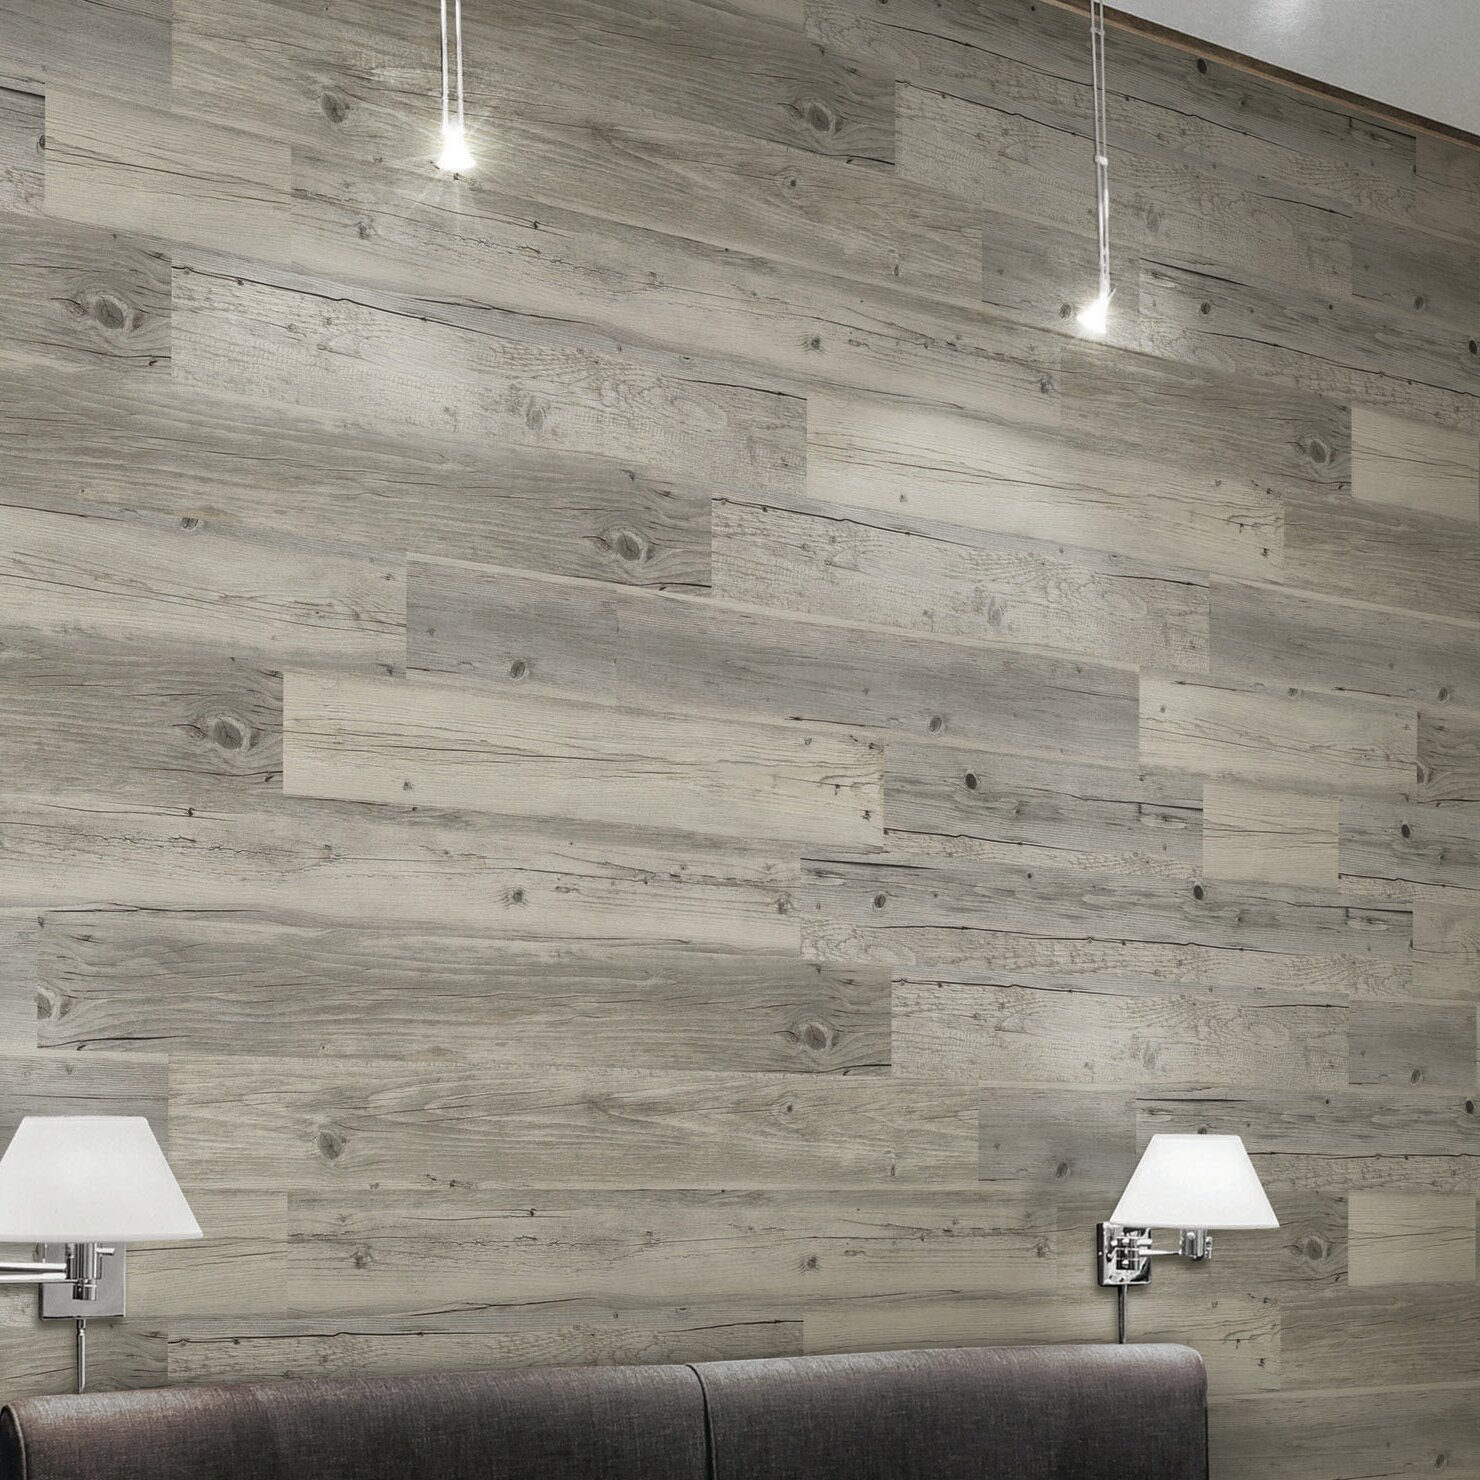 Halsteadinternational Light Solidity 5 Vinyl Wall Paneling In Harbor Wood Reviews Wayfair